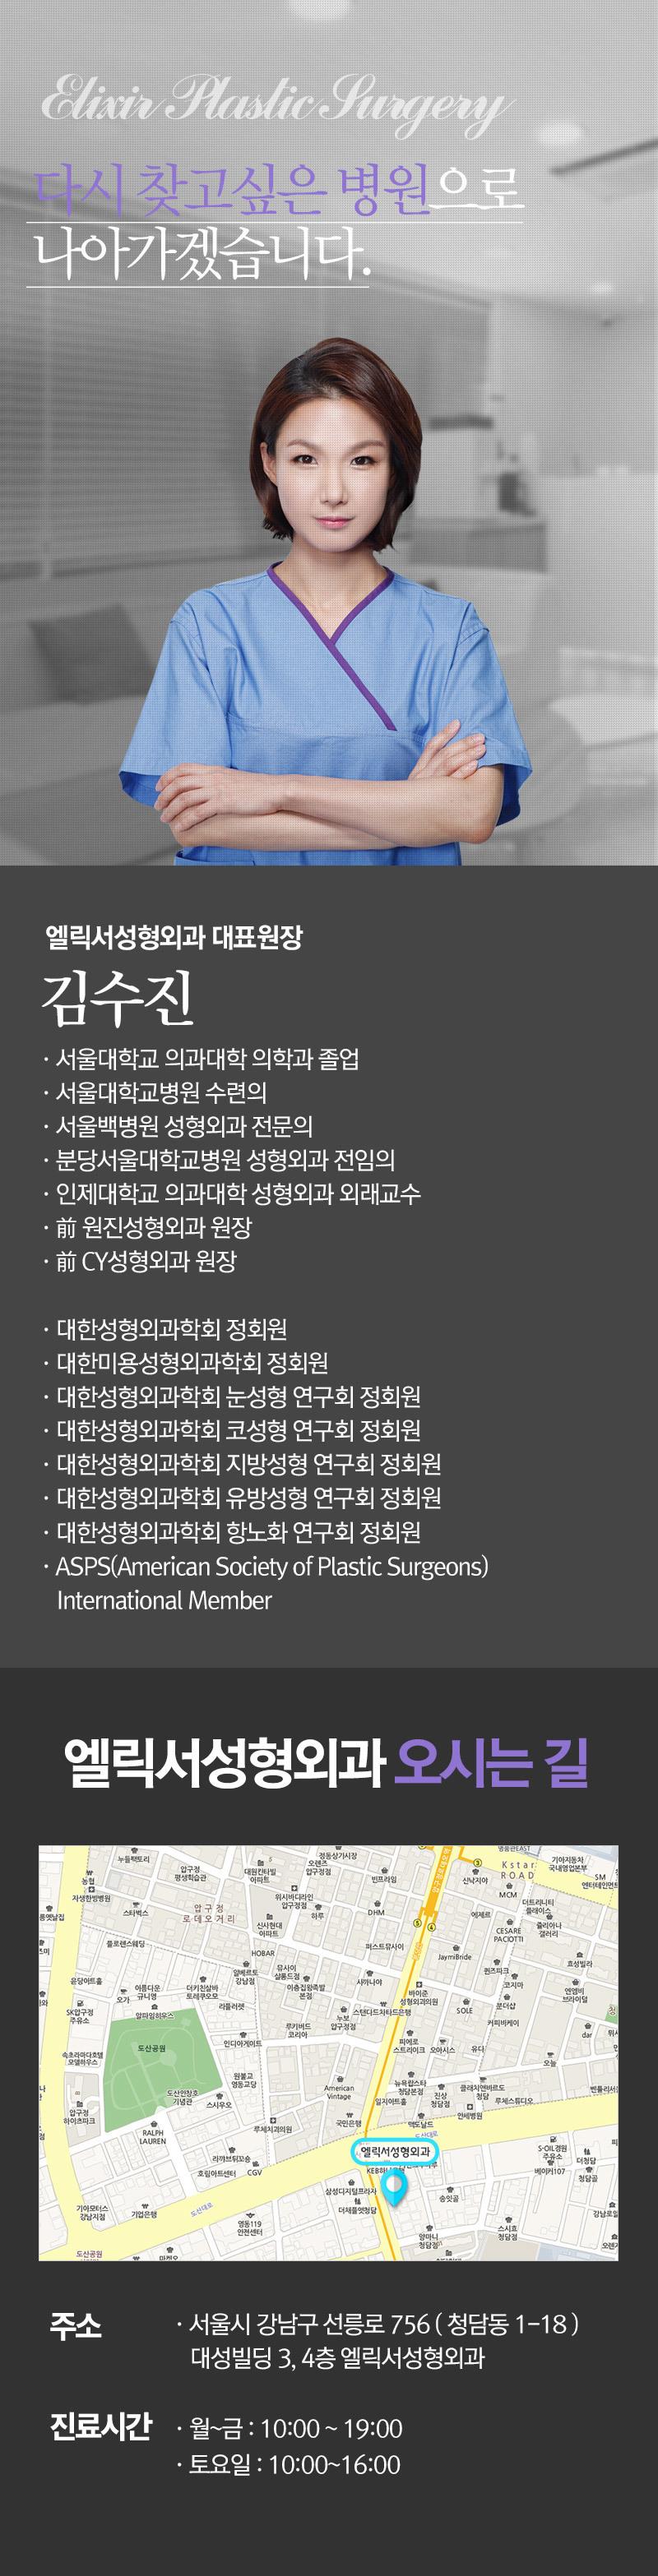 D event info b9e3147212cdc53914